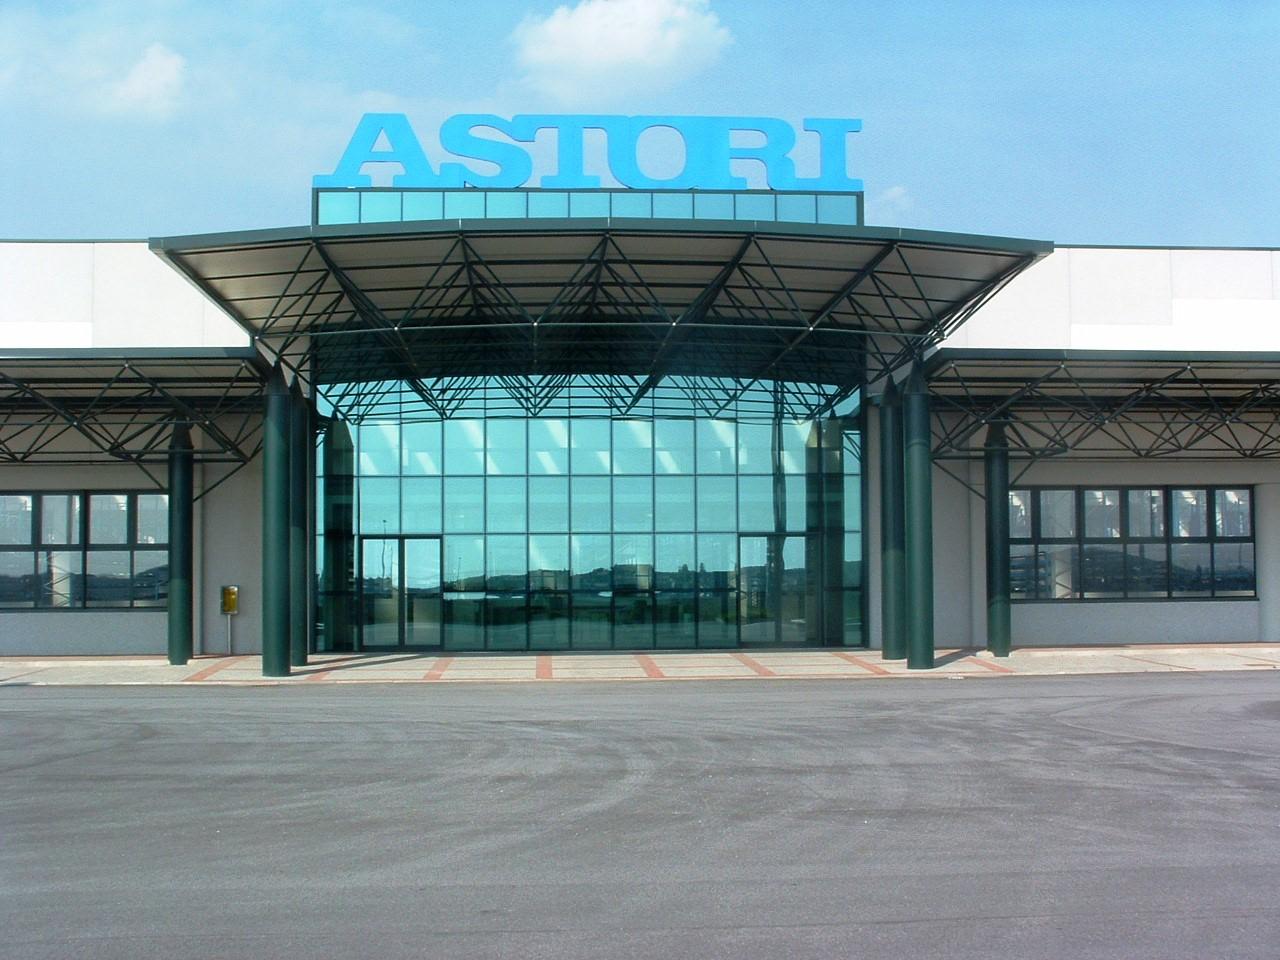 Astori (2)